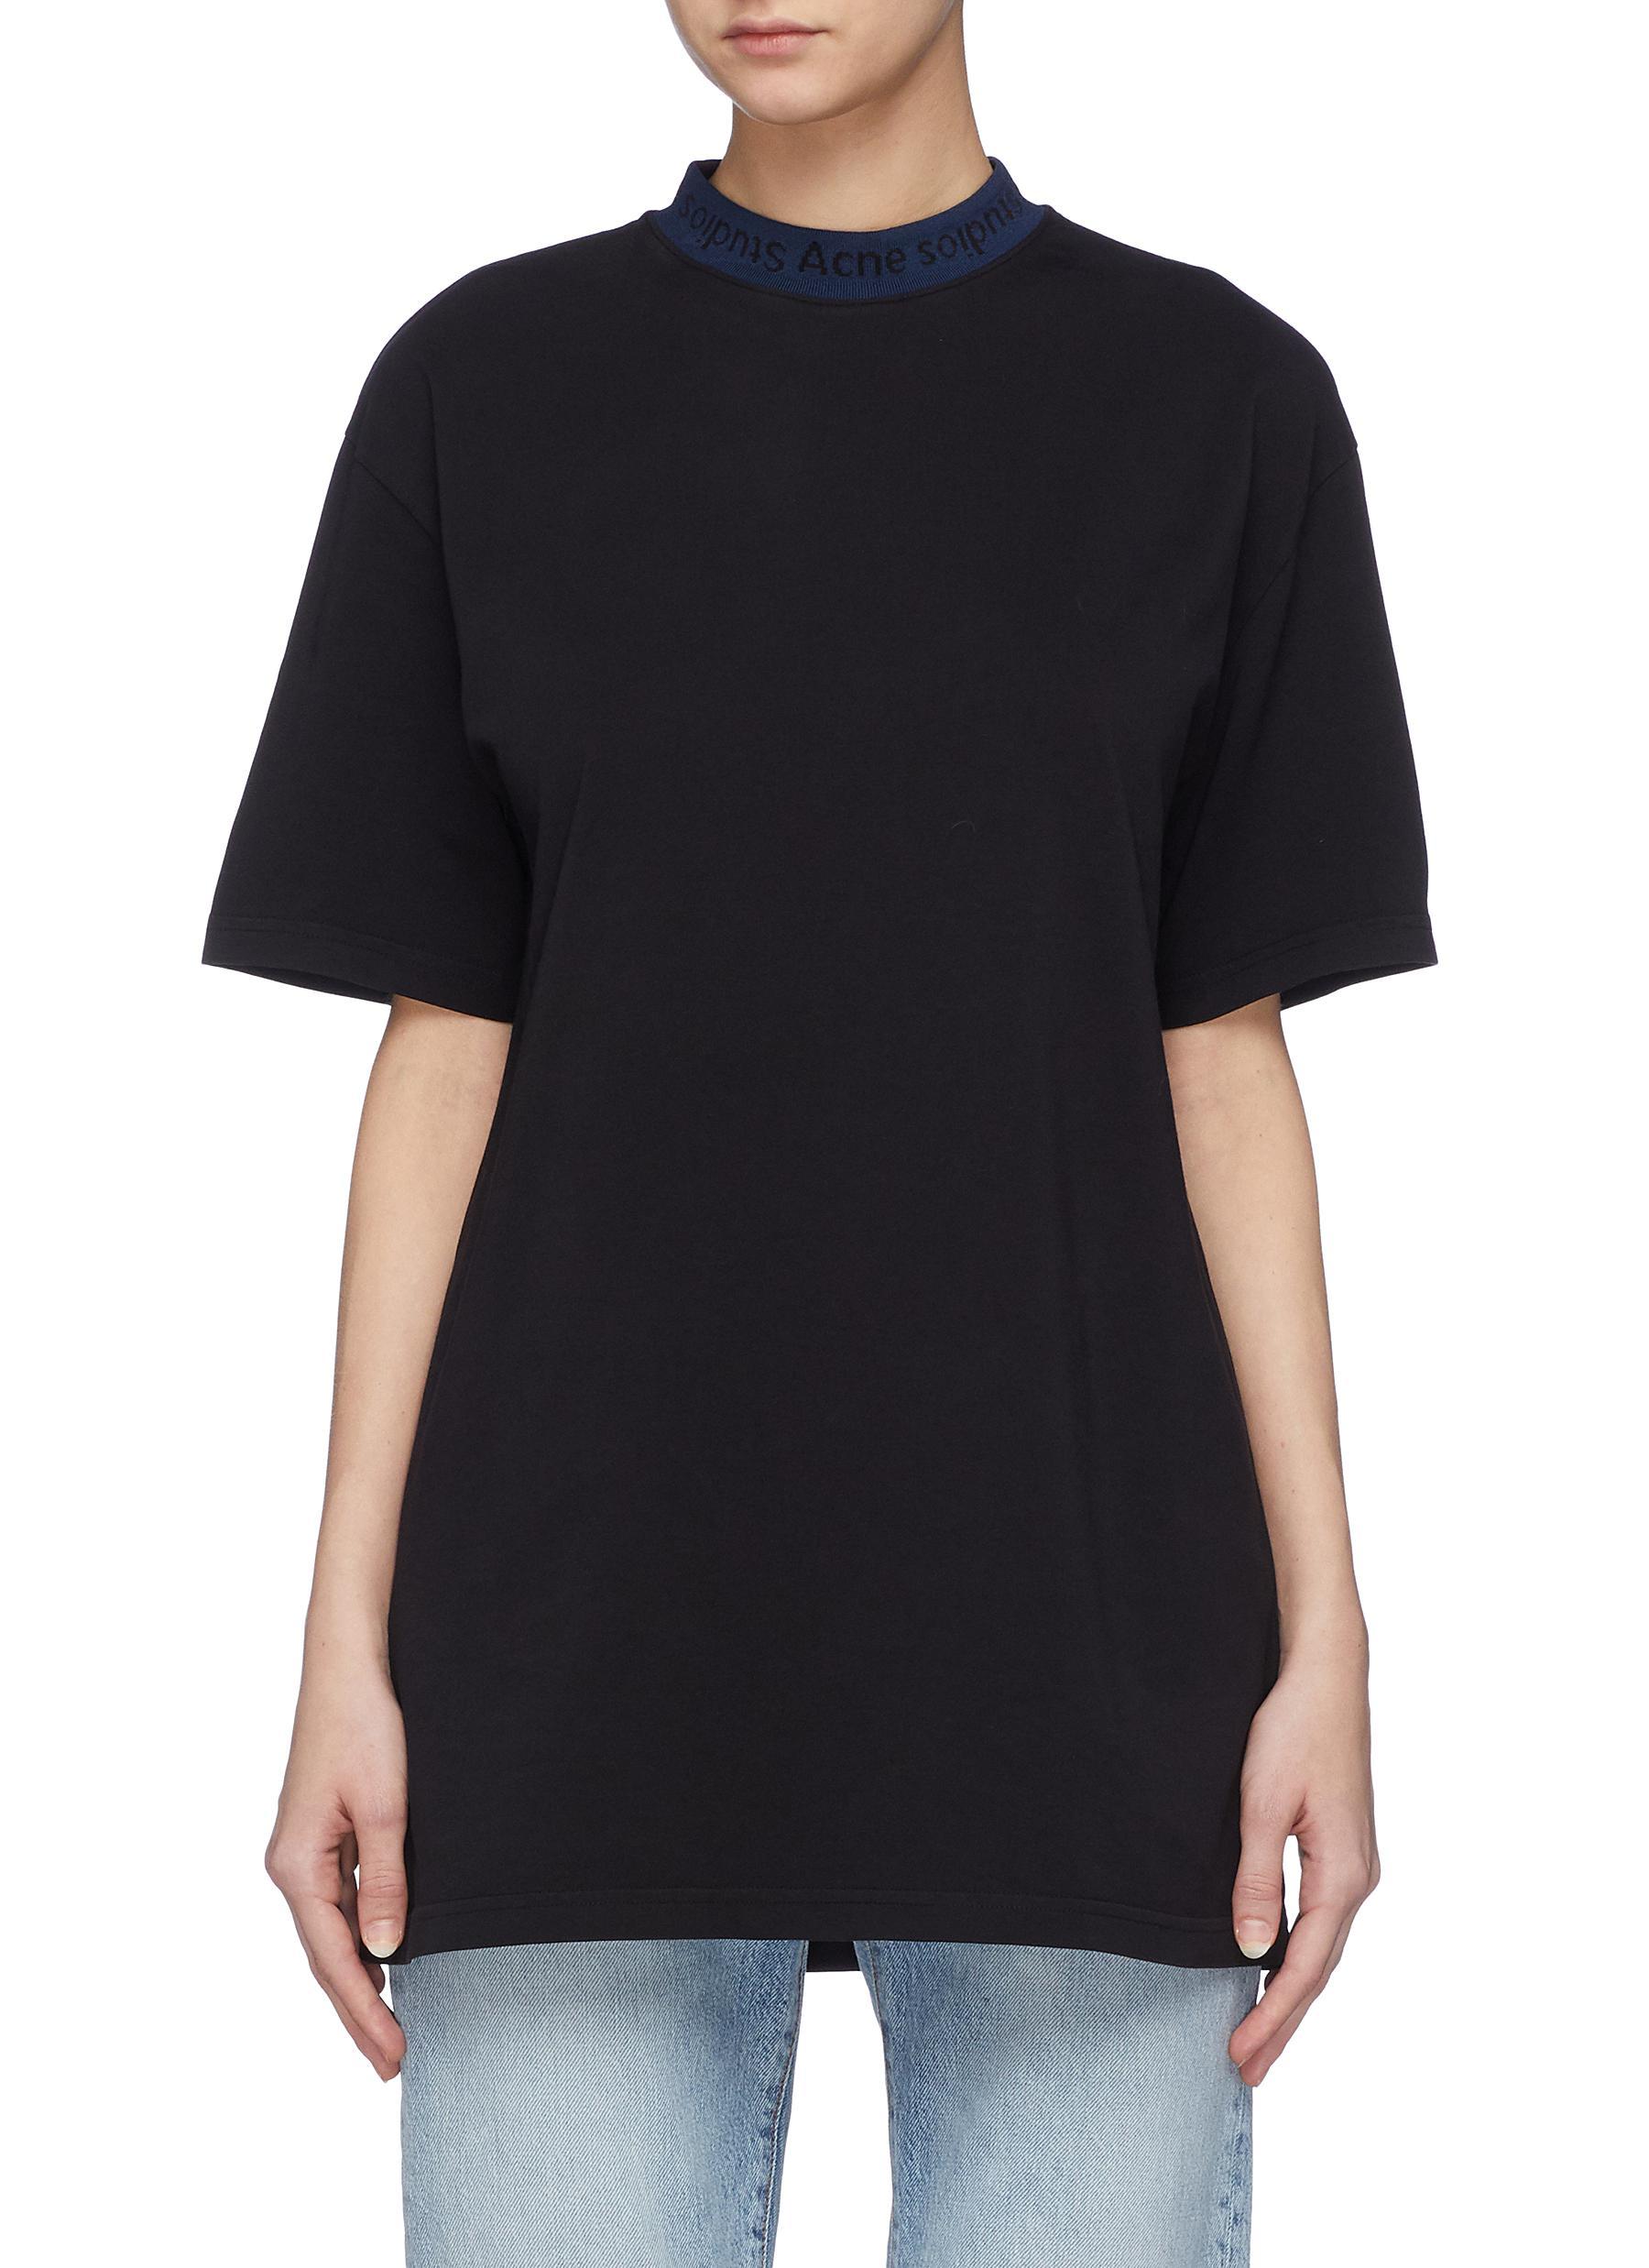 Logo jacquard collar T-shirt by Acne Studios